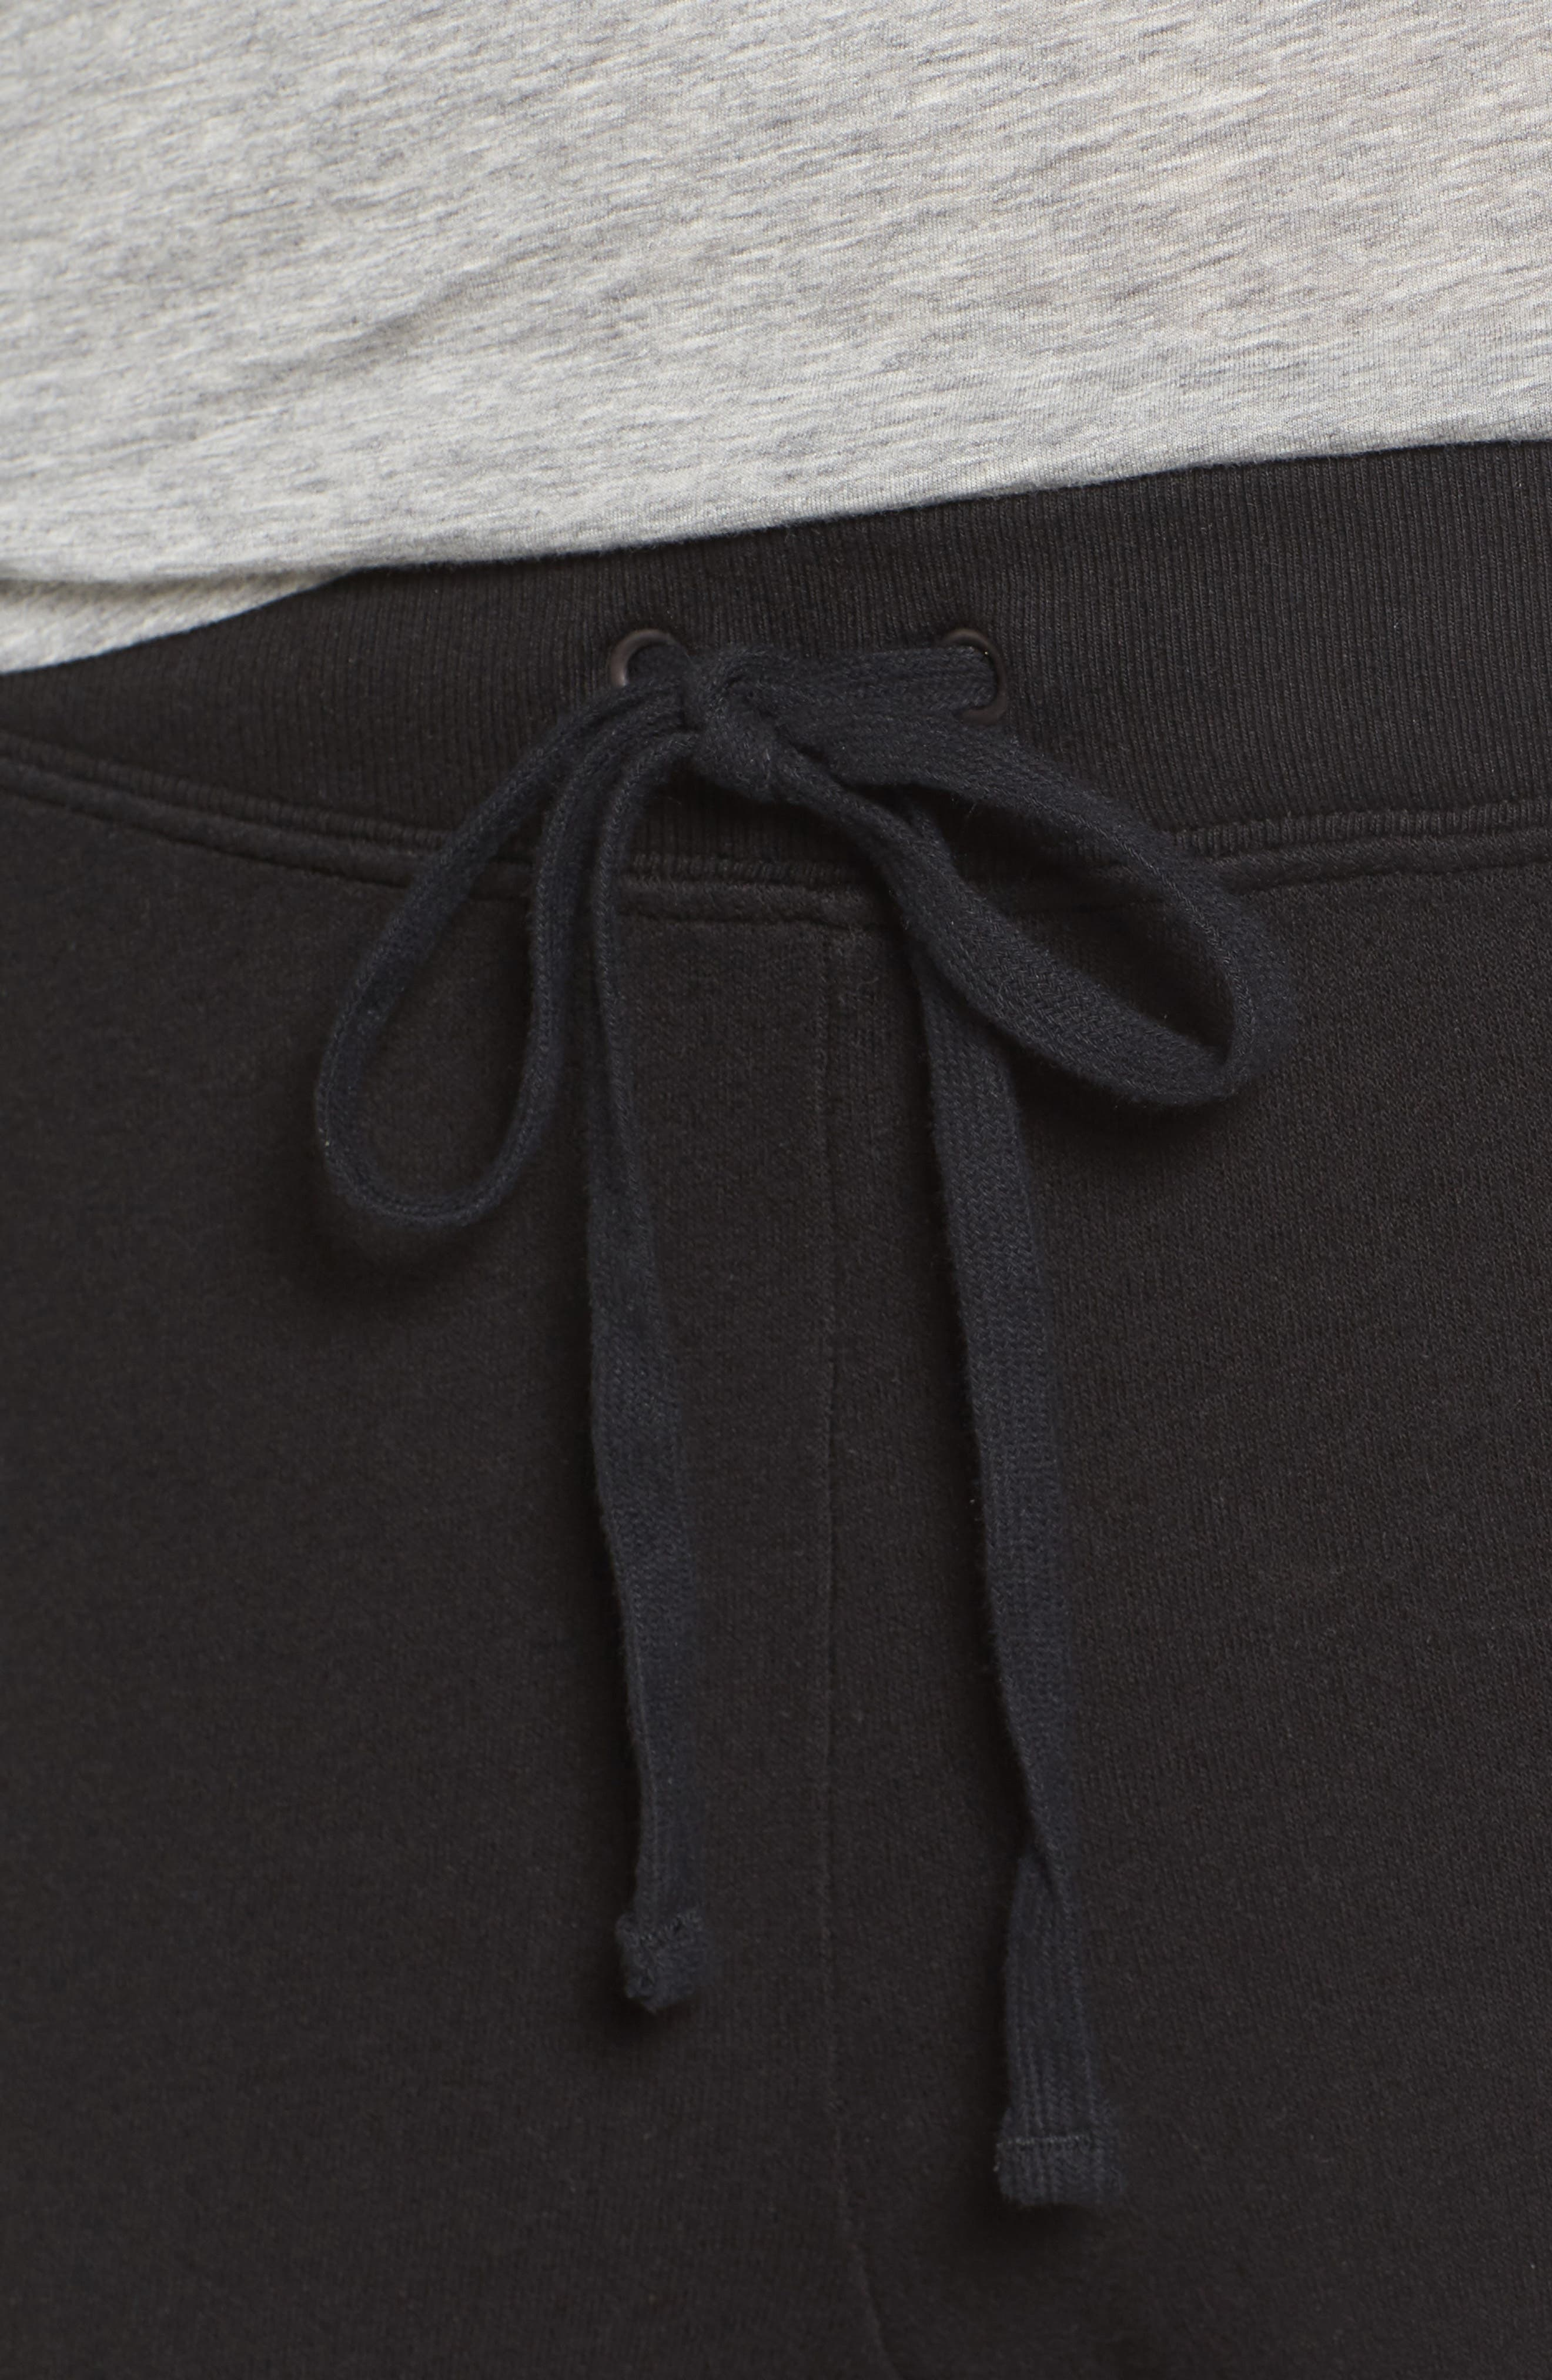 Betsee Distressed Jogger Pants,                             Alternate thumbnail 4, color,                             001